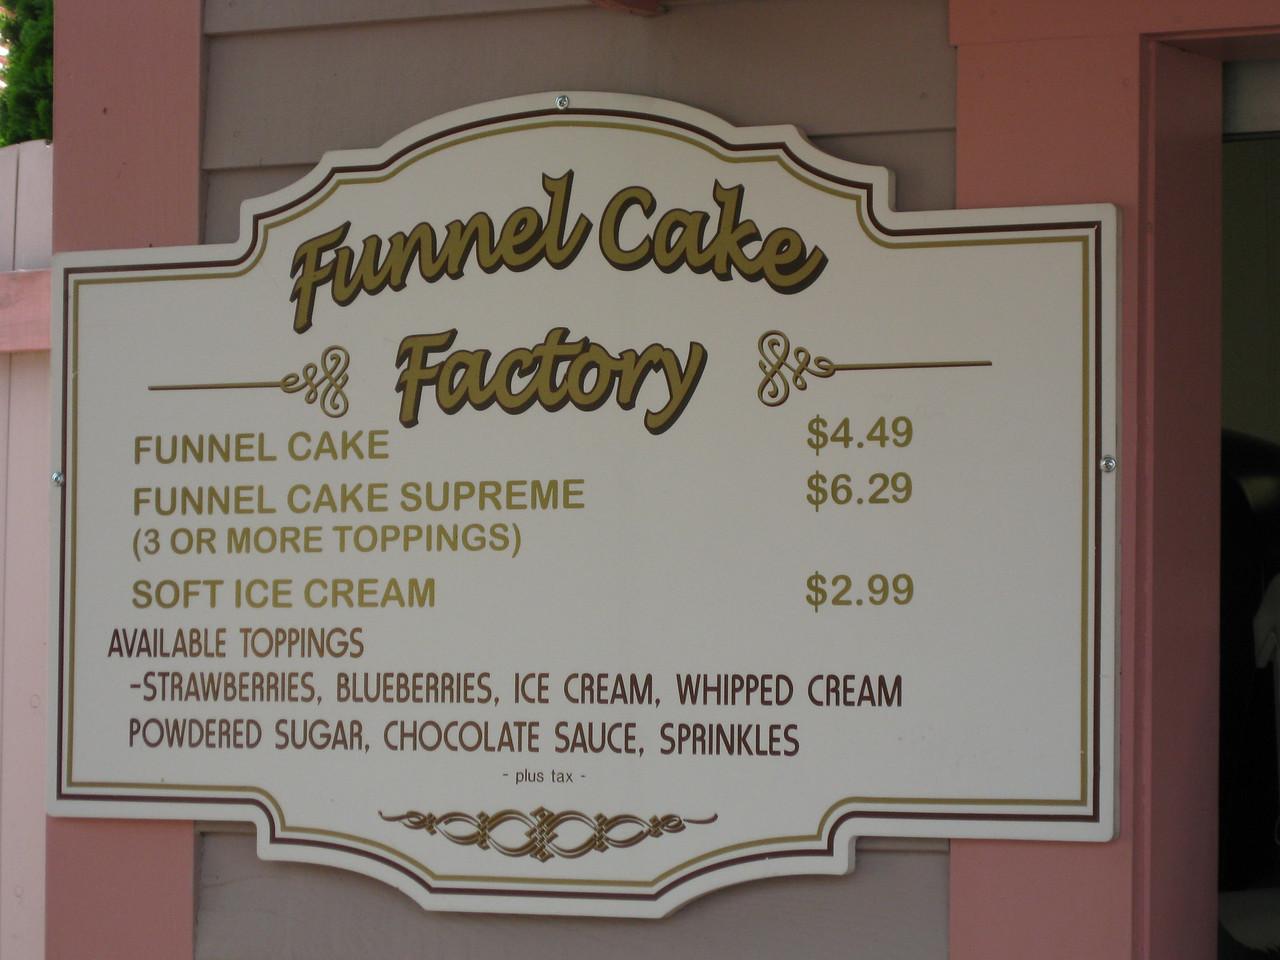 Funnel Cake Factory menu.